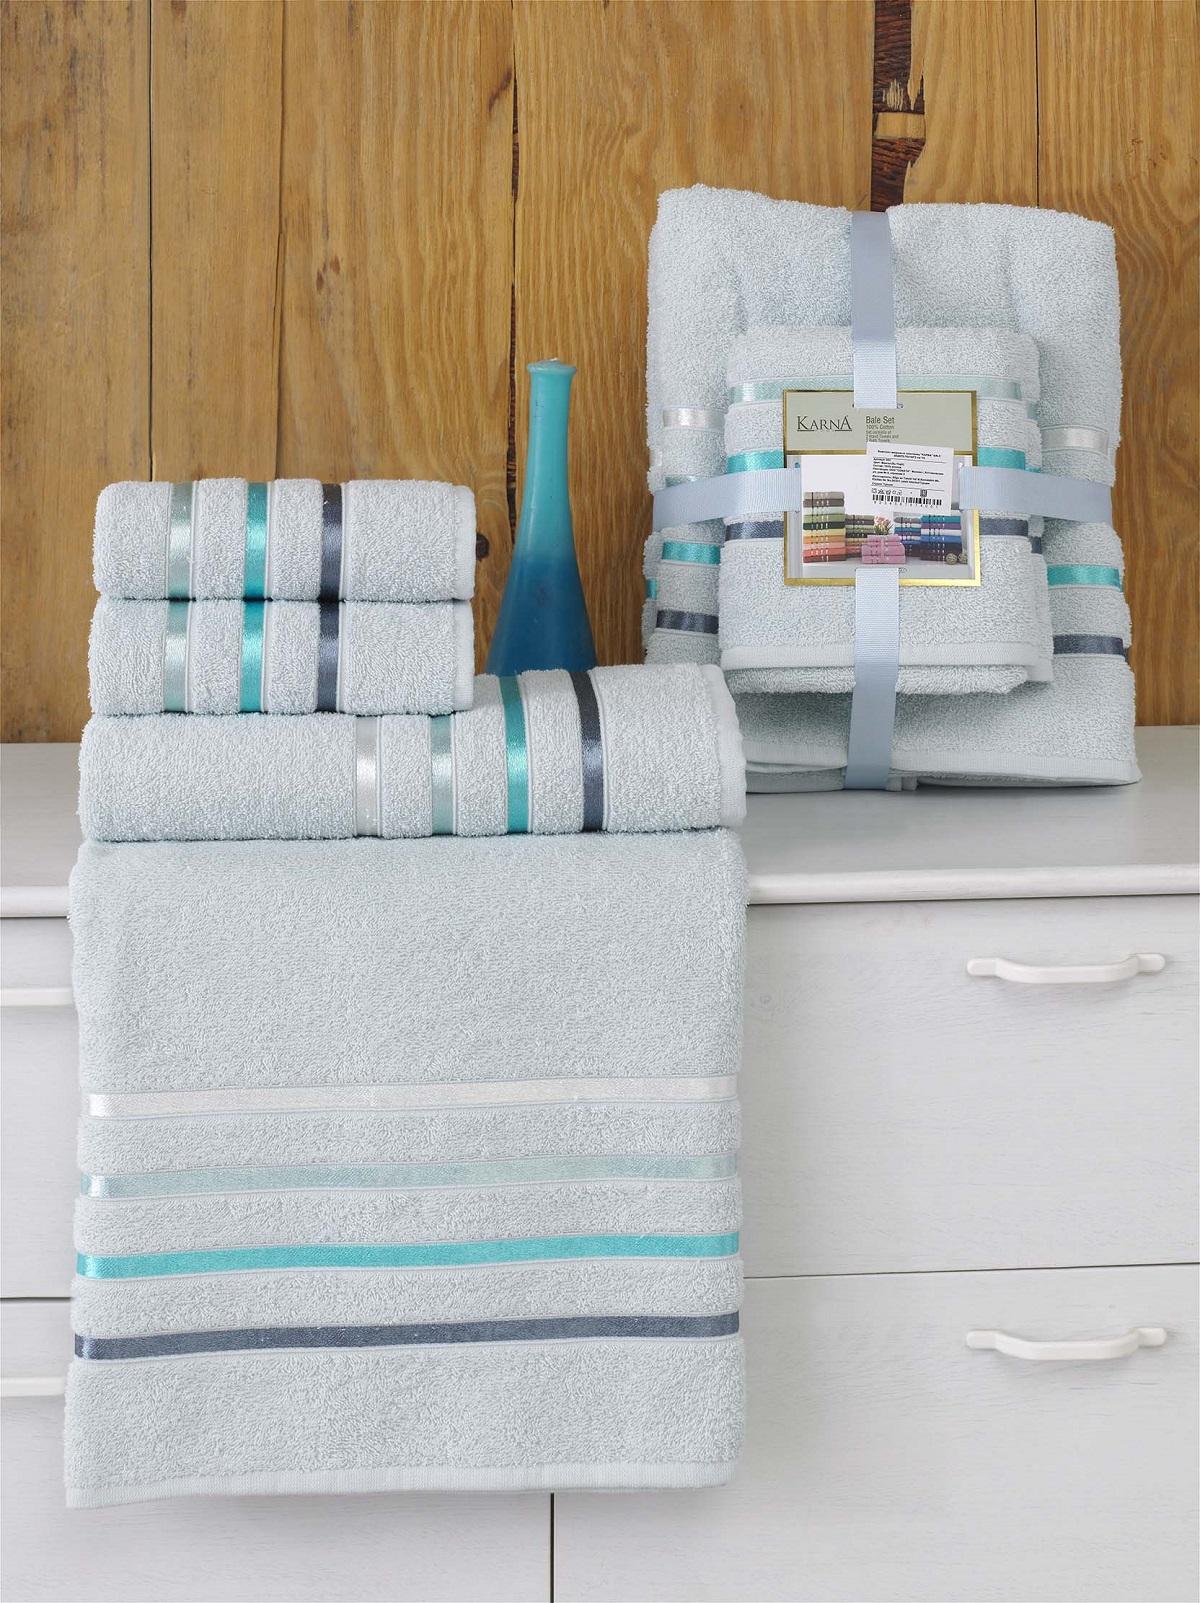 Полотенца Karna Полотенце Bale Цвет: Ментол (Набор) полотенца karna полотенце bale цвет розовый набор